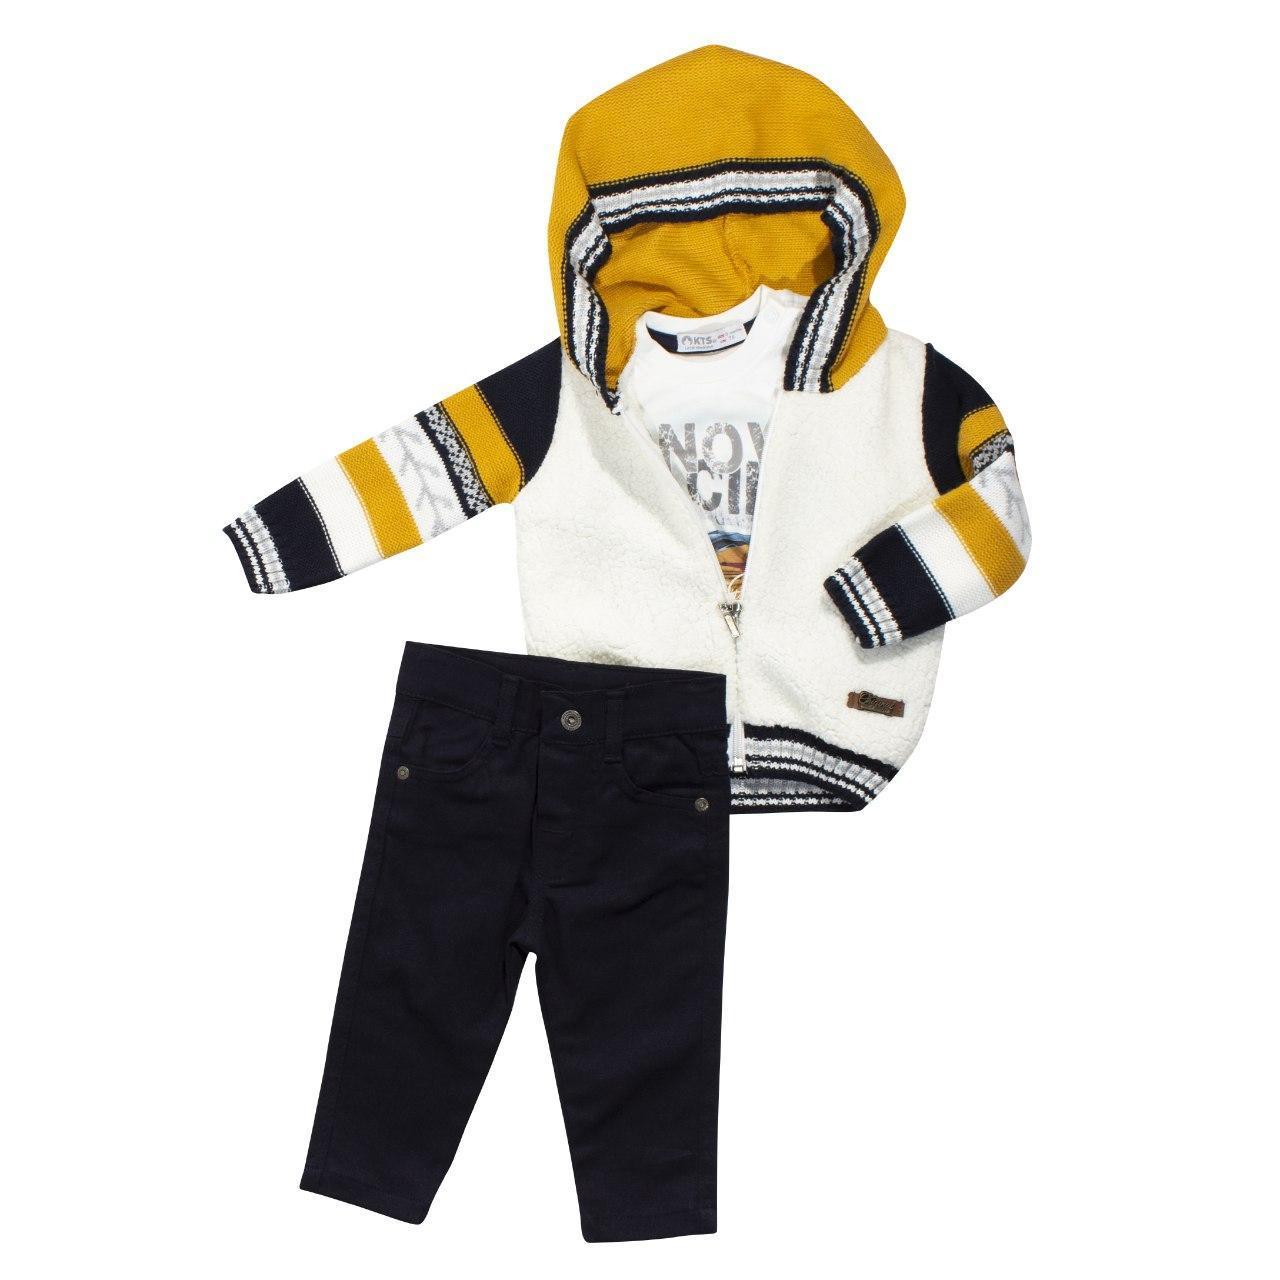 Теплый костюм из 3-х единиц для мальчика, размеры 9, 12 мес, 2 года